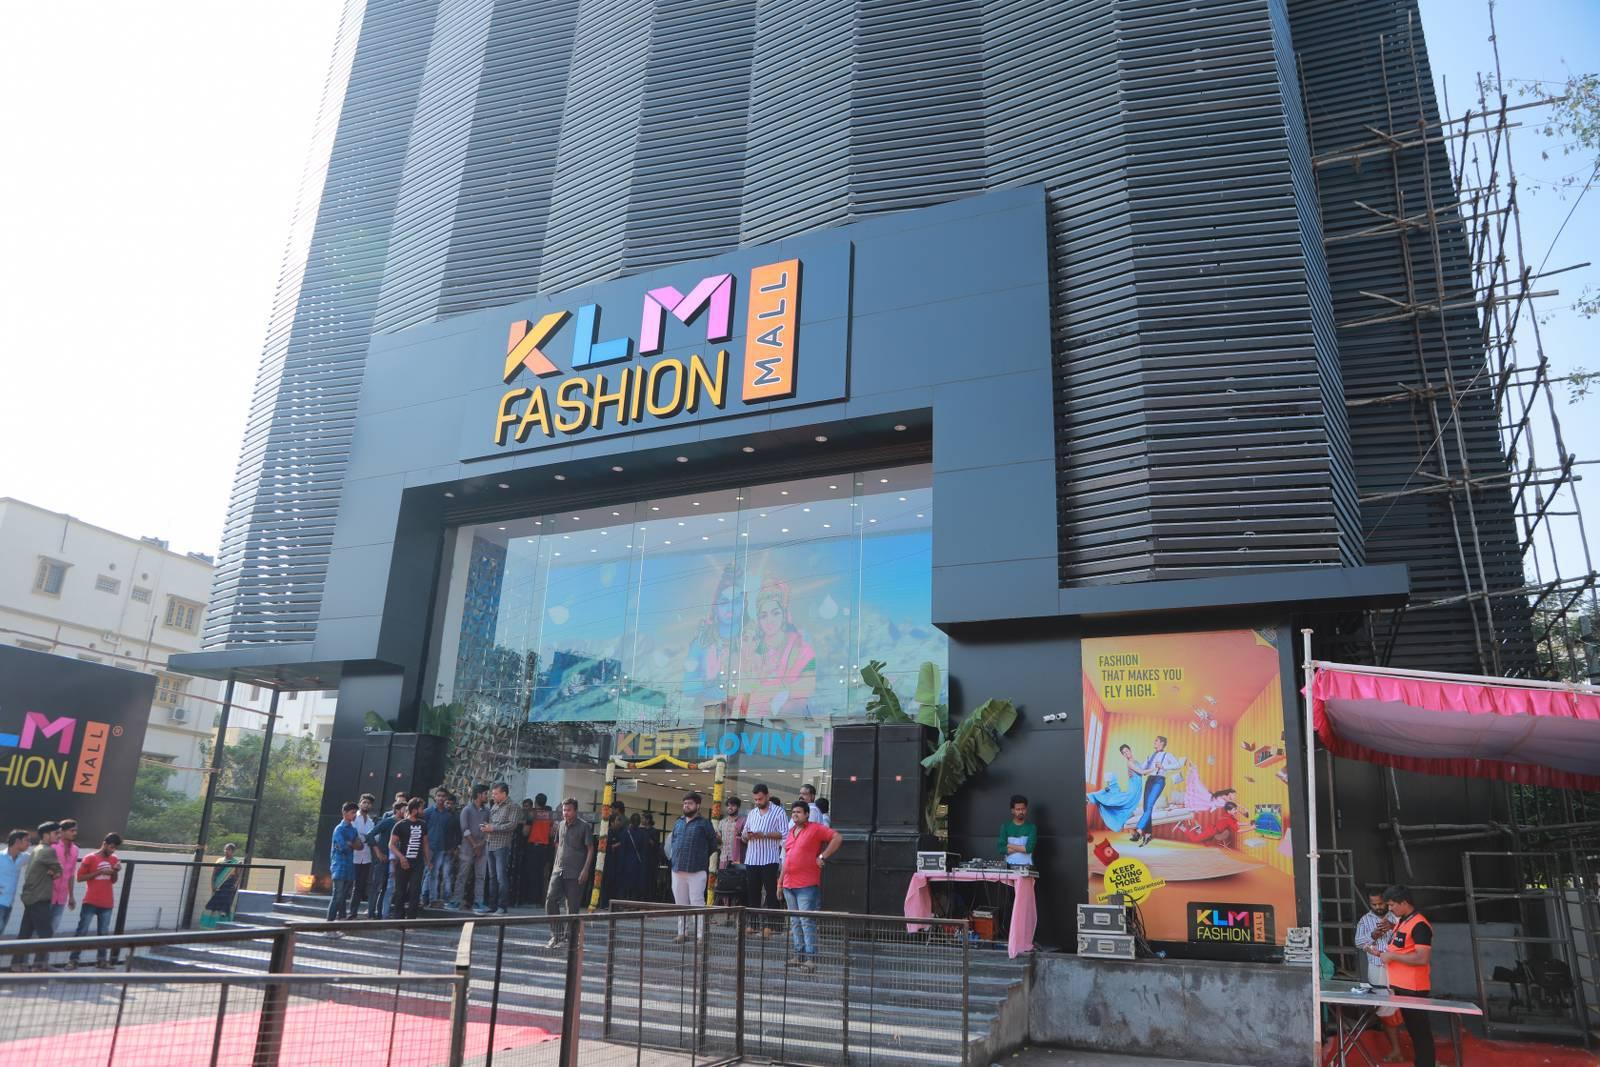 KLM fashion mall Inaugurated by Vijay devarakonda at Chandanagar 17